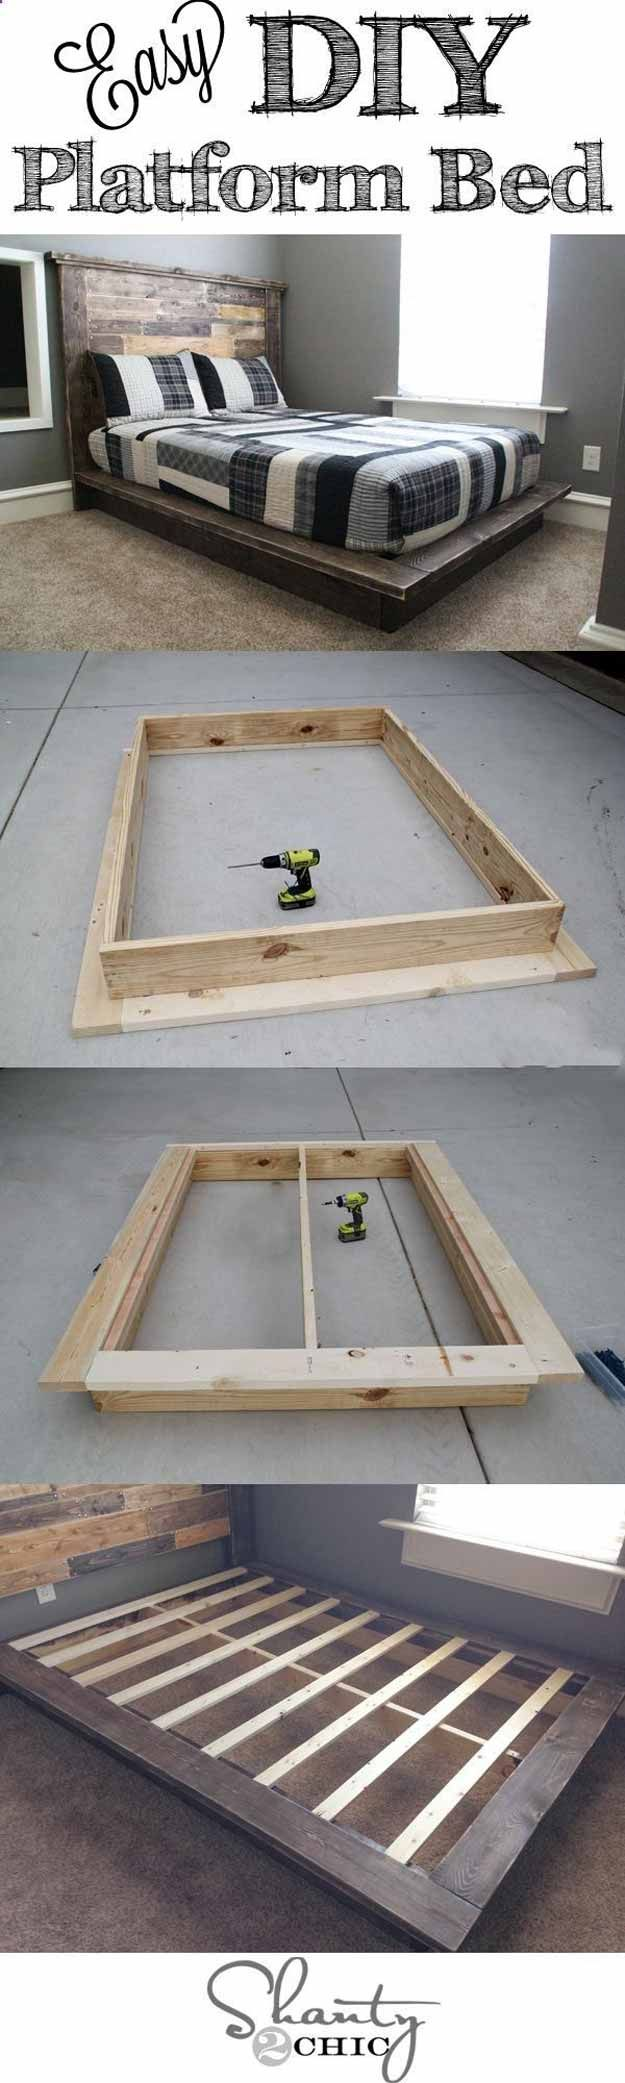 Crafty DIY beds using platforms idea 2